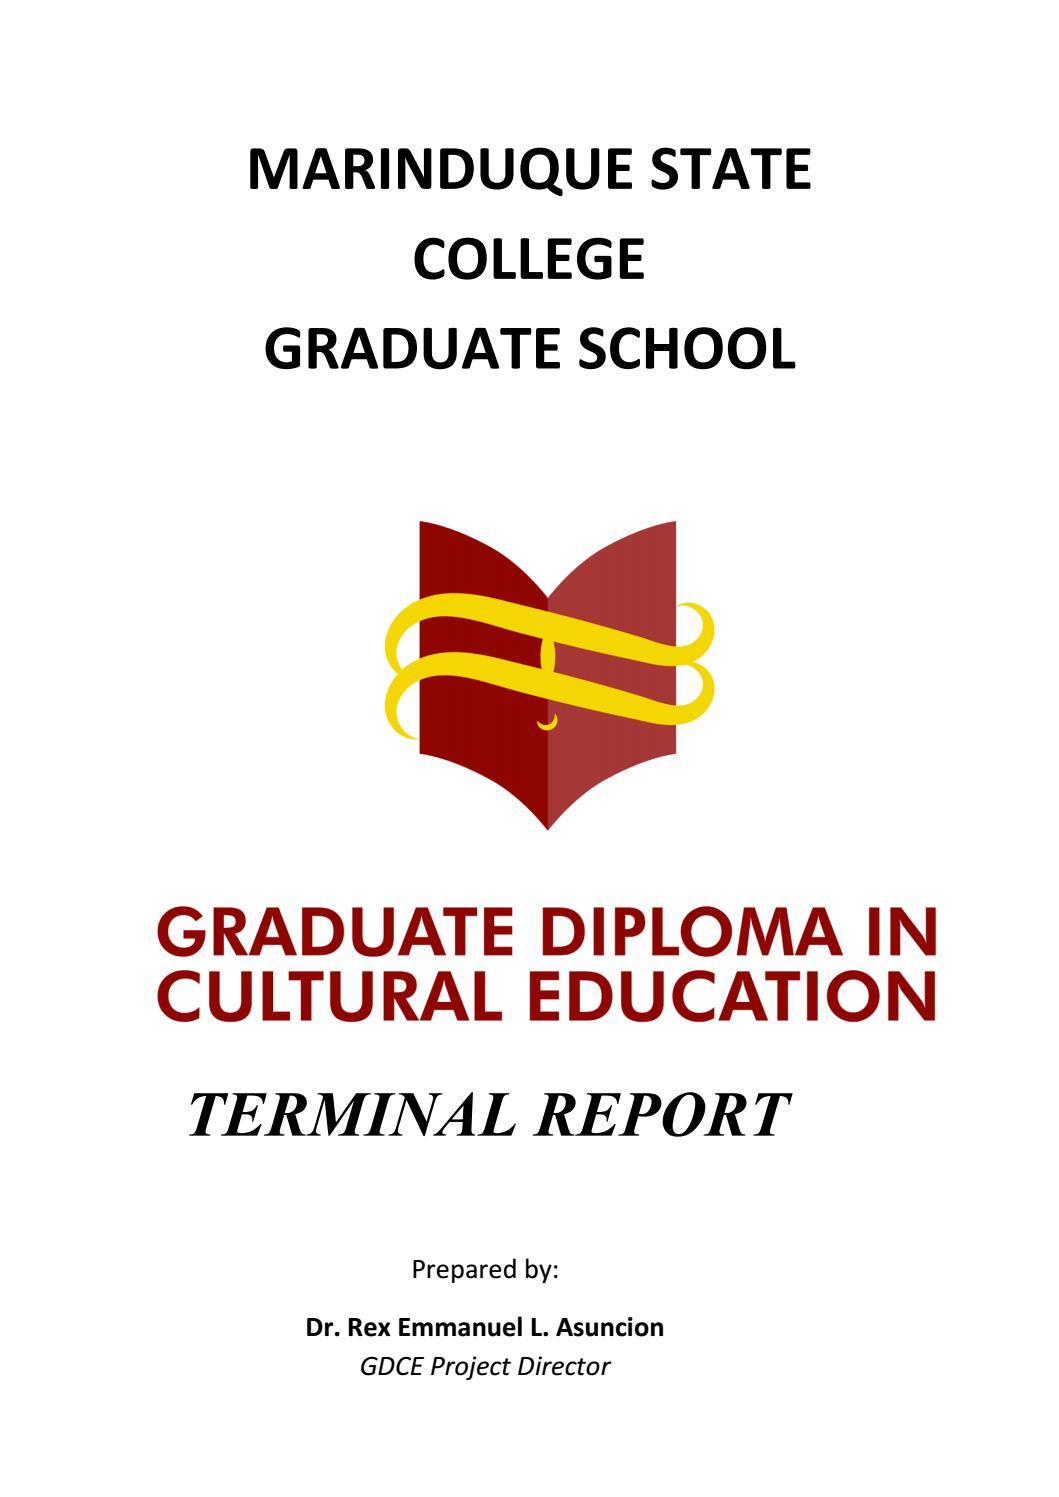 Graduate Diploma in Cultural Education Terminal Report by